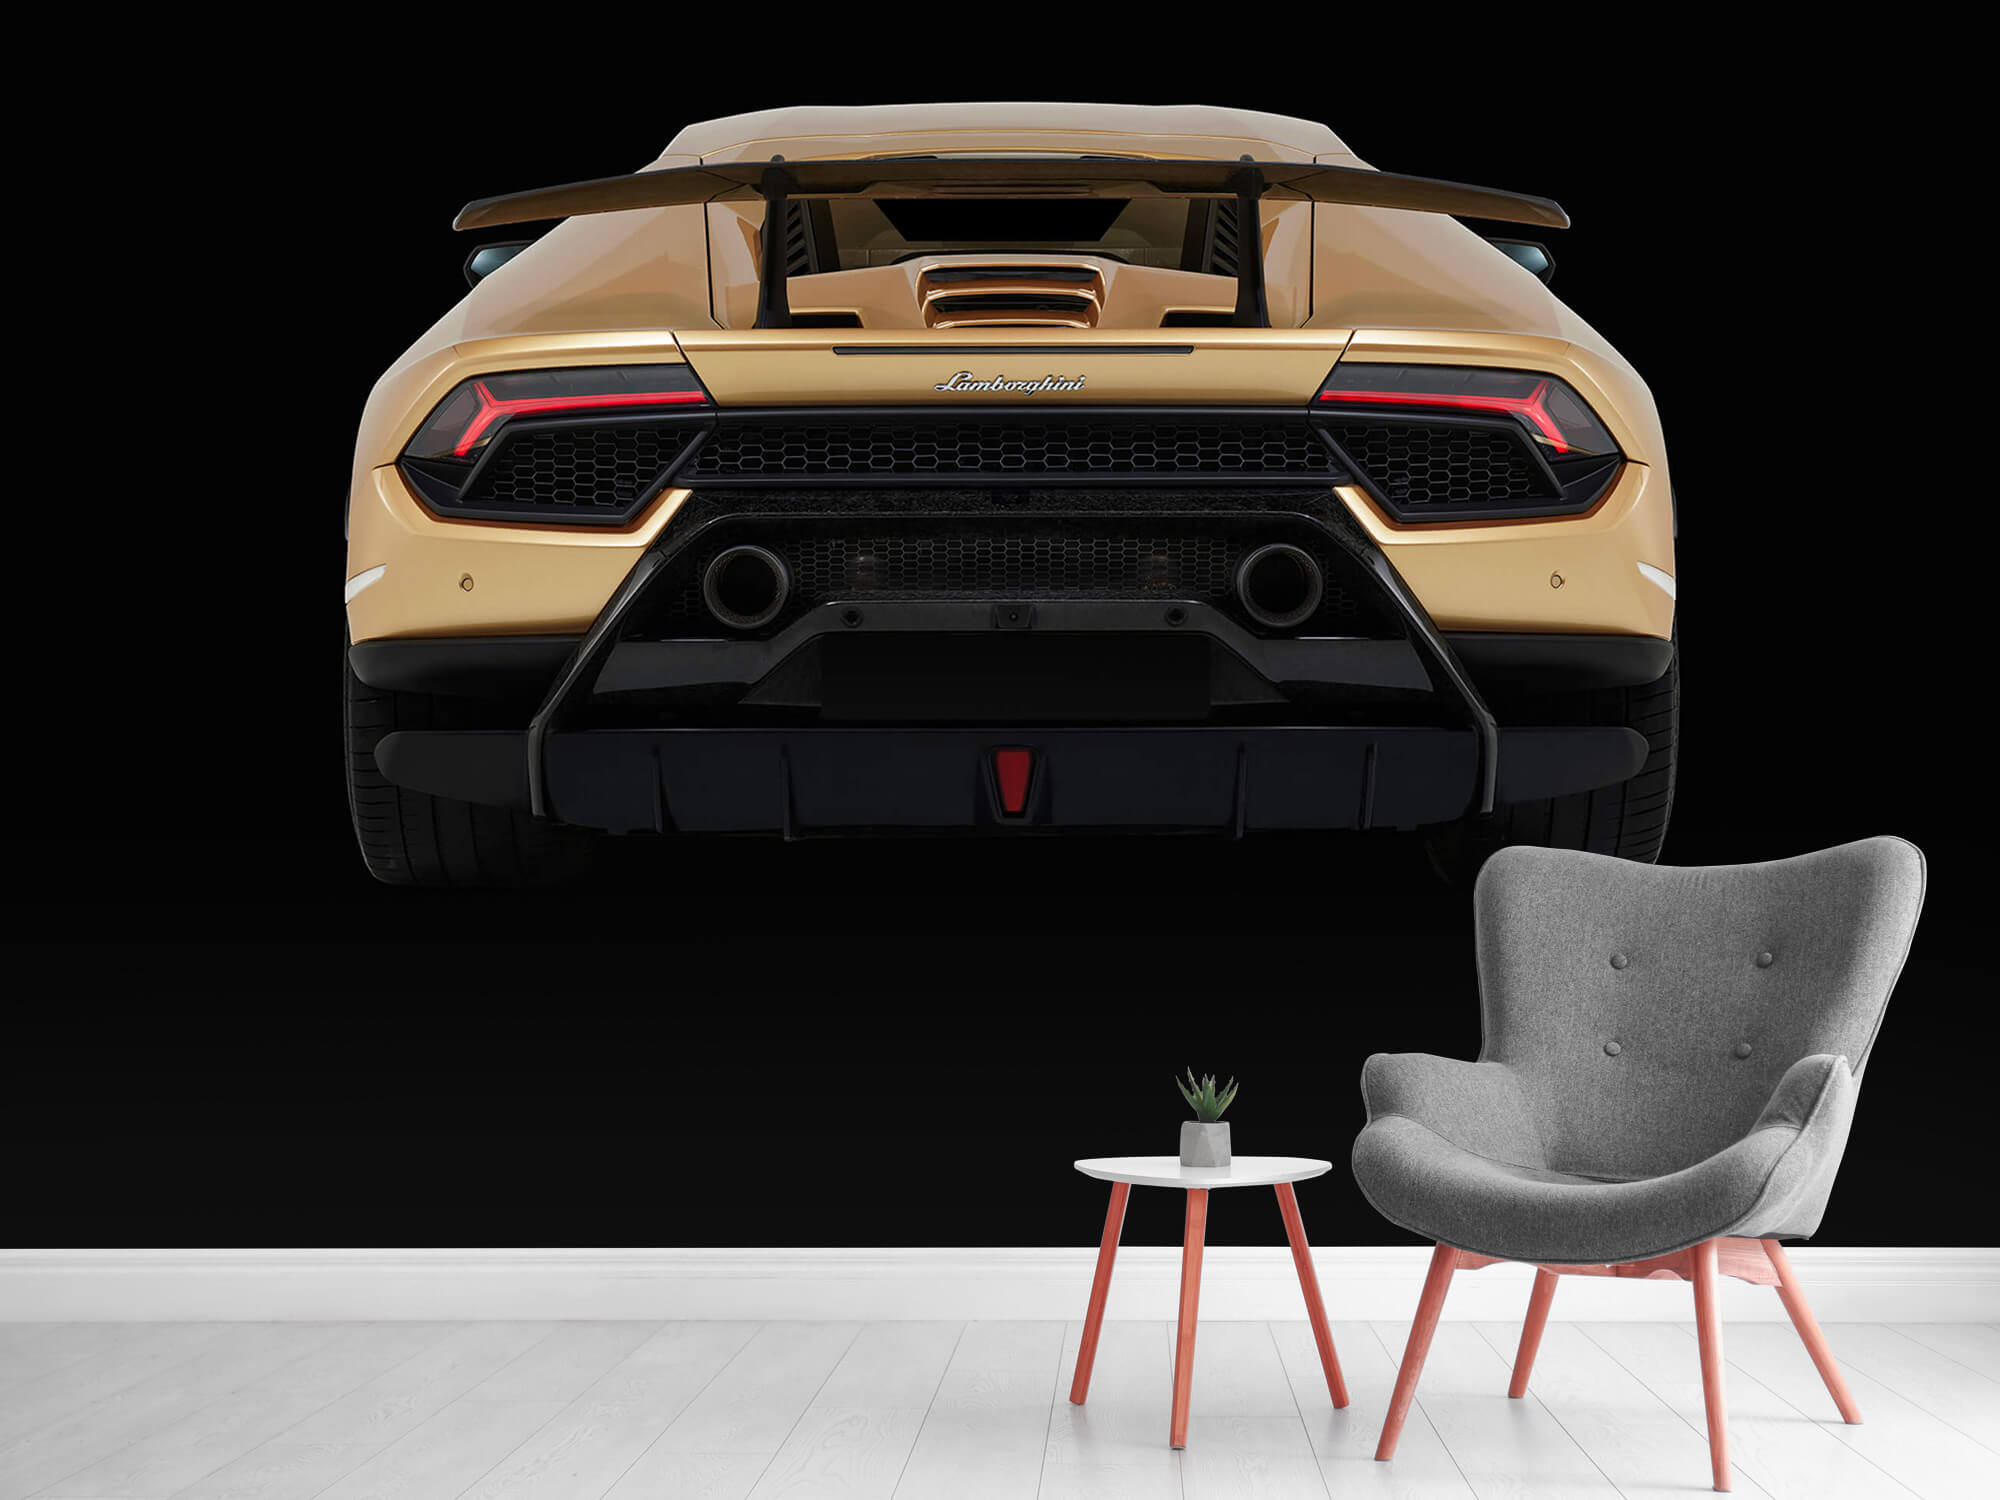 Wallpaper Lamborghini Huracán - Arrière, noir 11